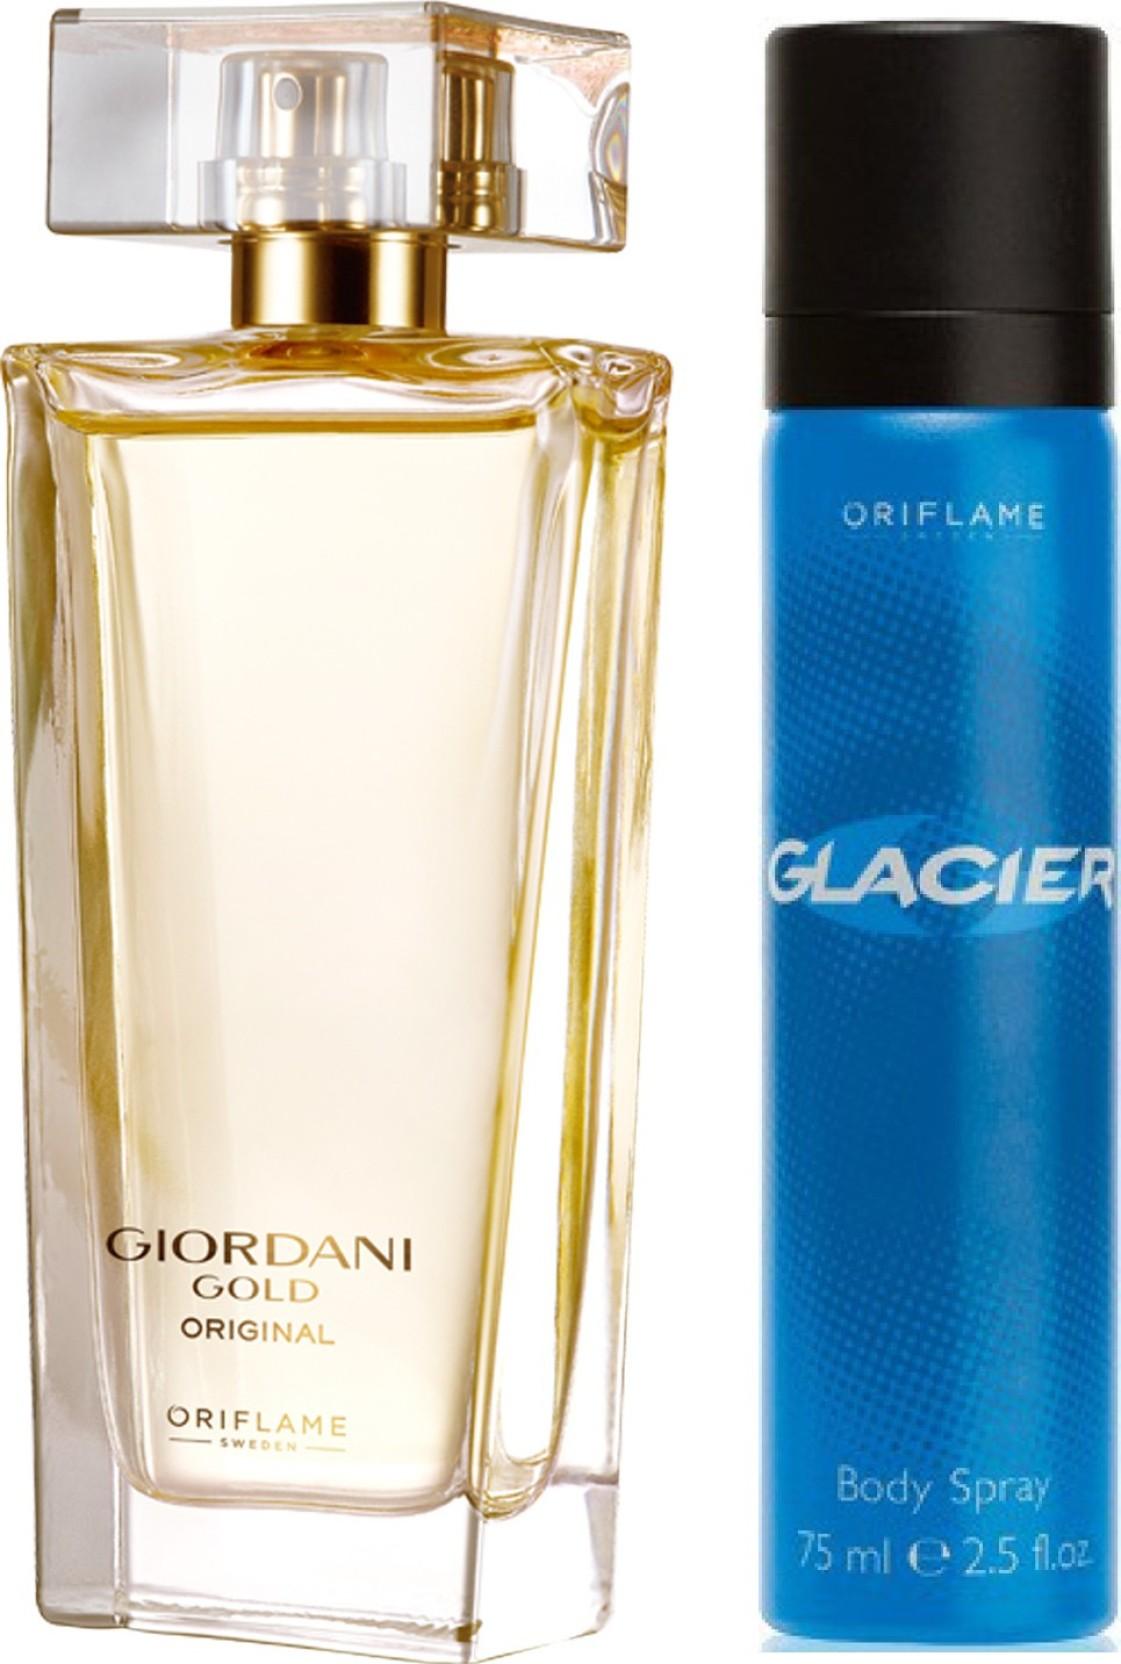 Oriflame Sweden Giordani Gold Original Eau De Parfum 50ml 32150 Miss Body Lotion Share